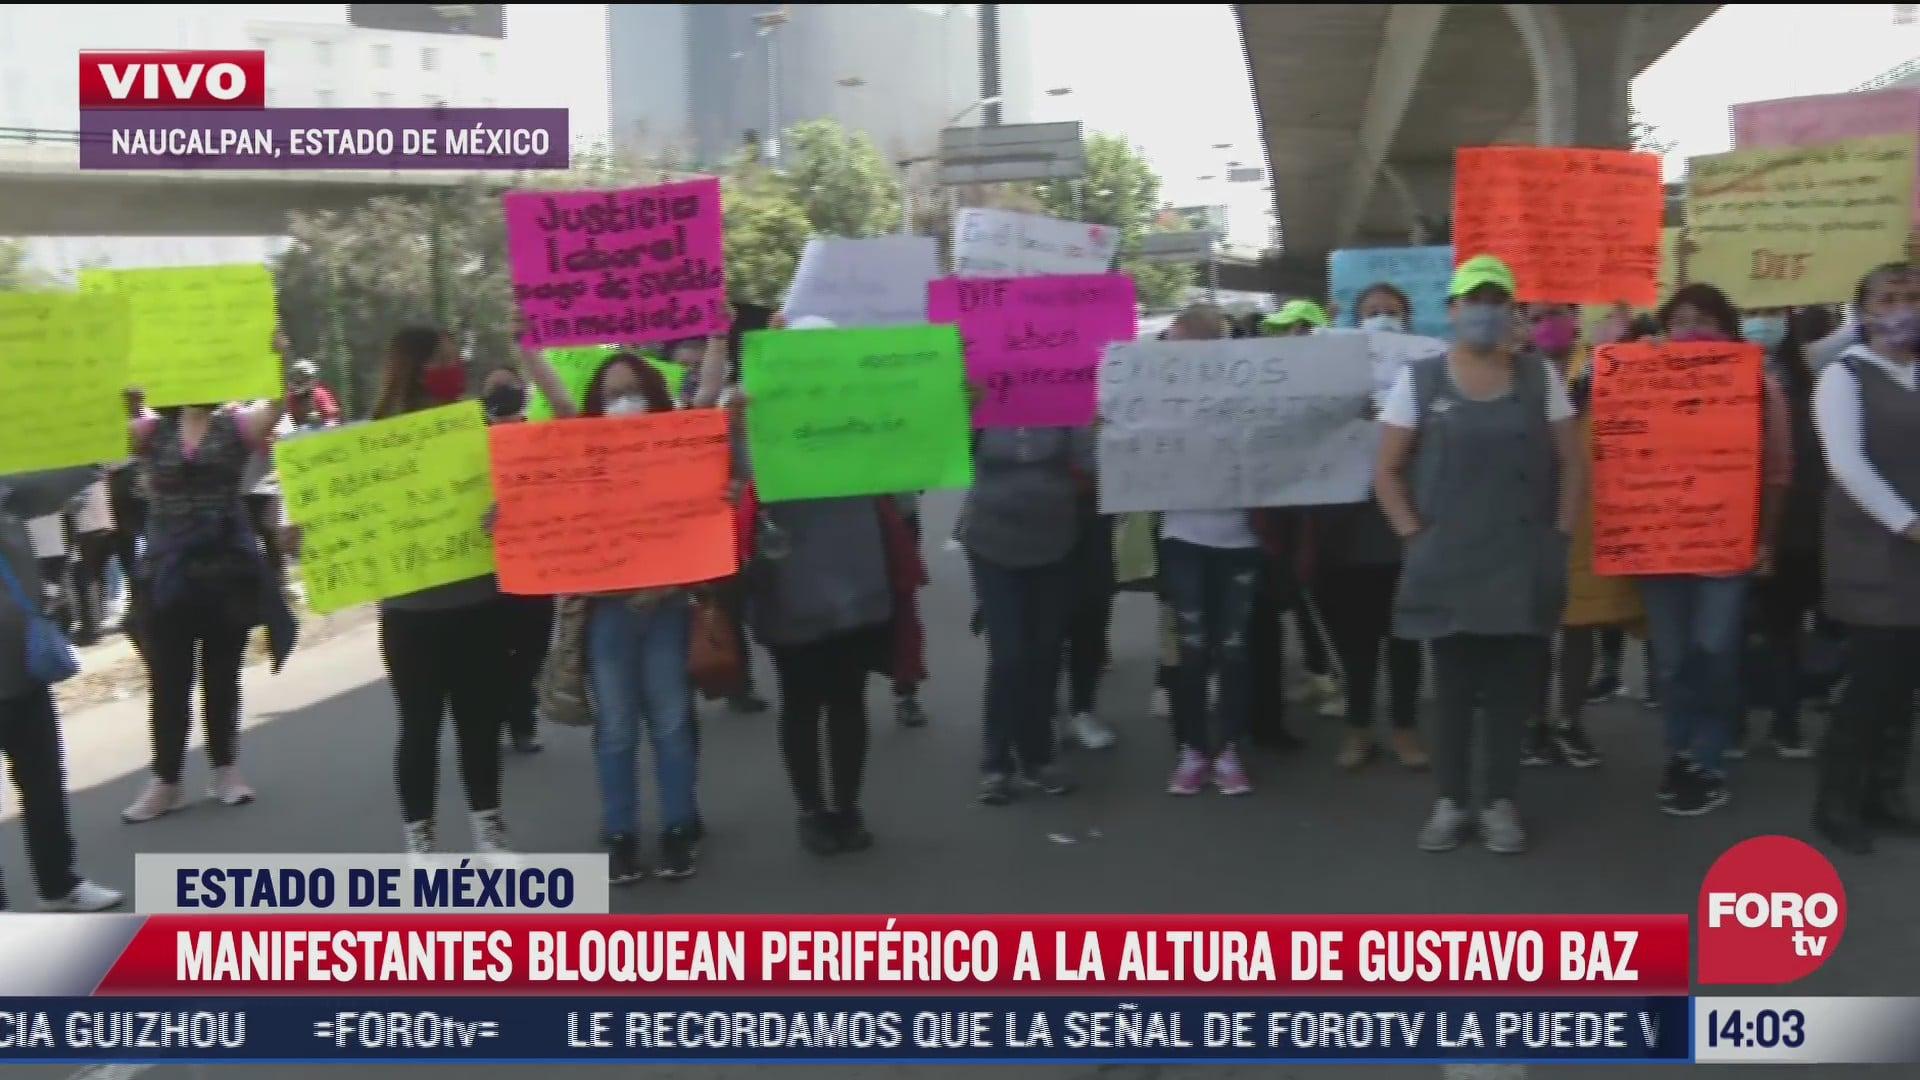 manifestantes afectan periferico a la altura de gustavo baz